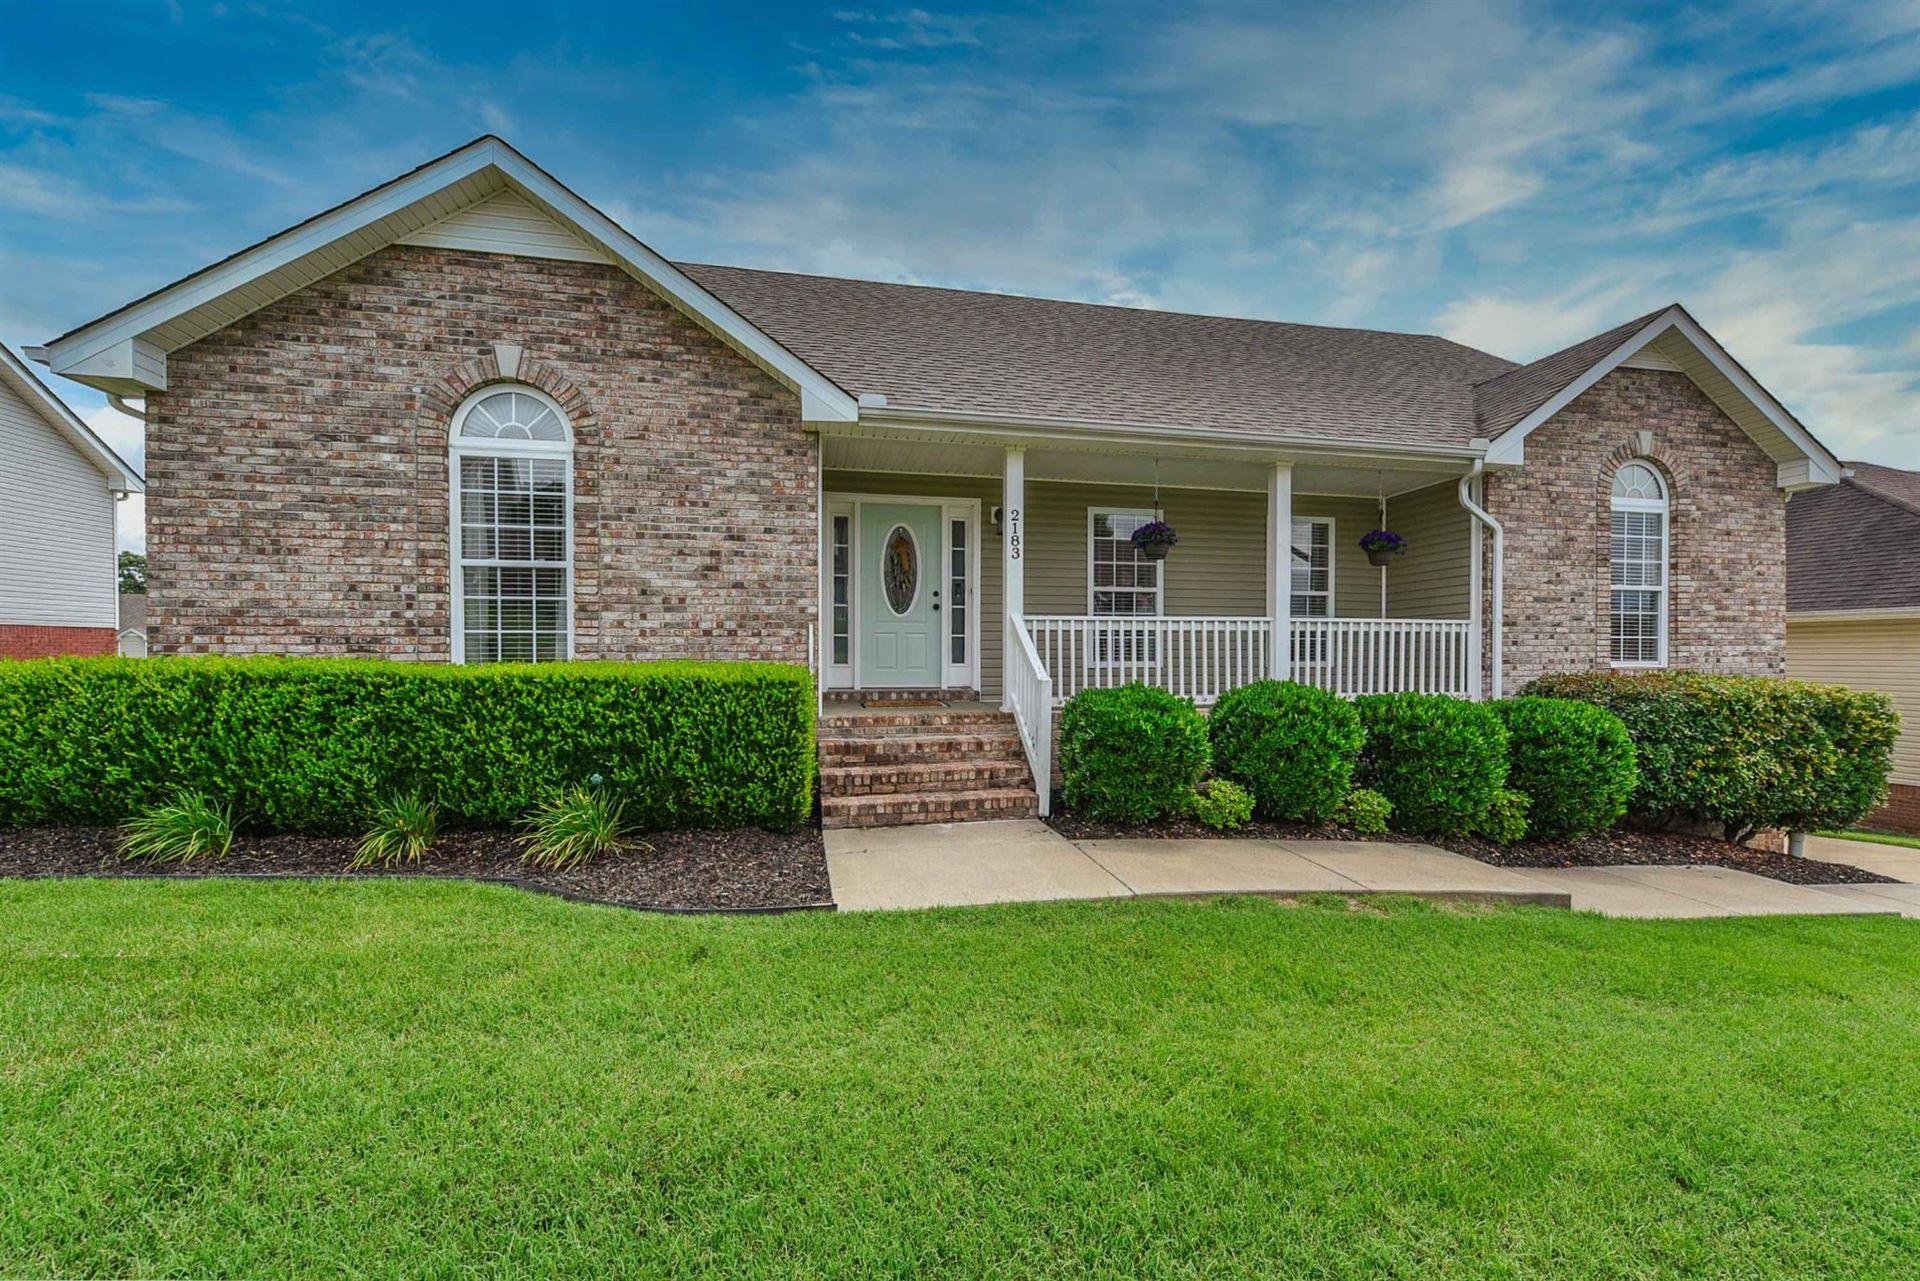 2183 Powell Rd, Clarksville, TN 37043 - MLS#: 2272769